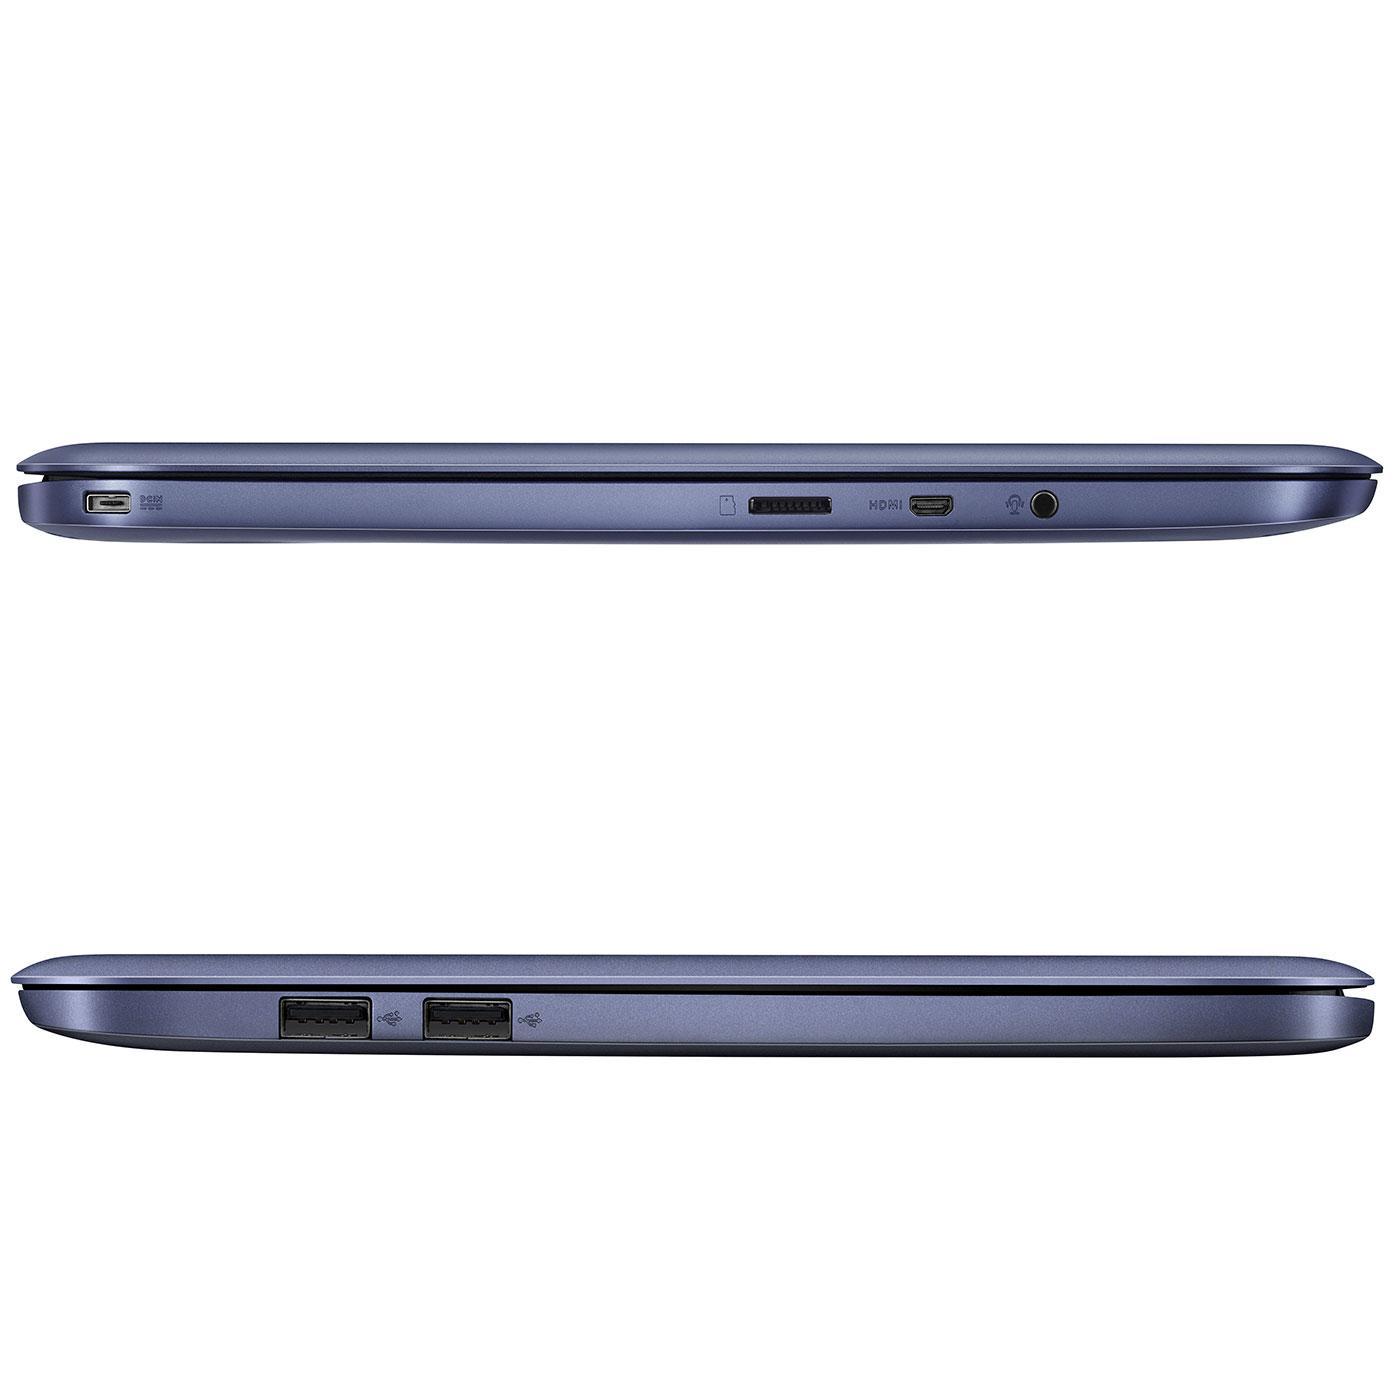 Asus X205TA-BING-FD015BS -  1,33 GHz - SSD 32 Go - RAM 2 Go - AZERTY